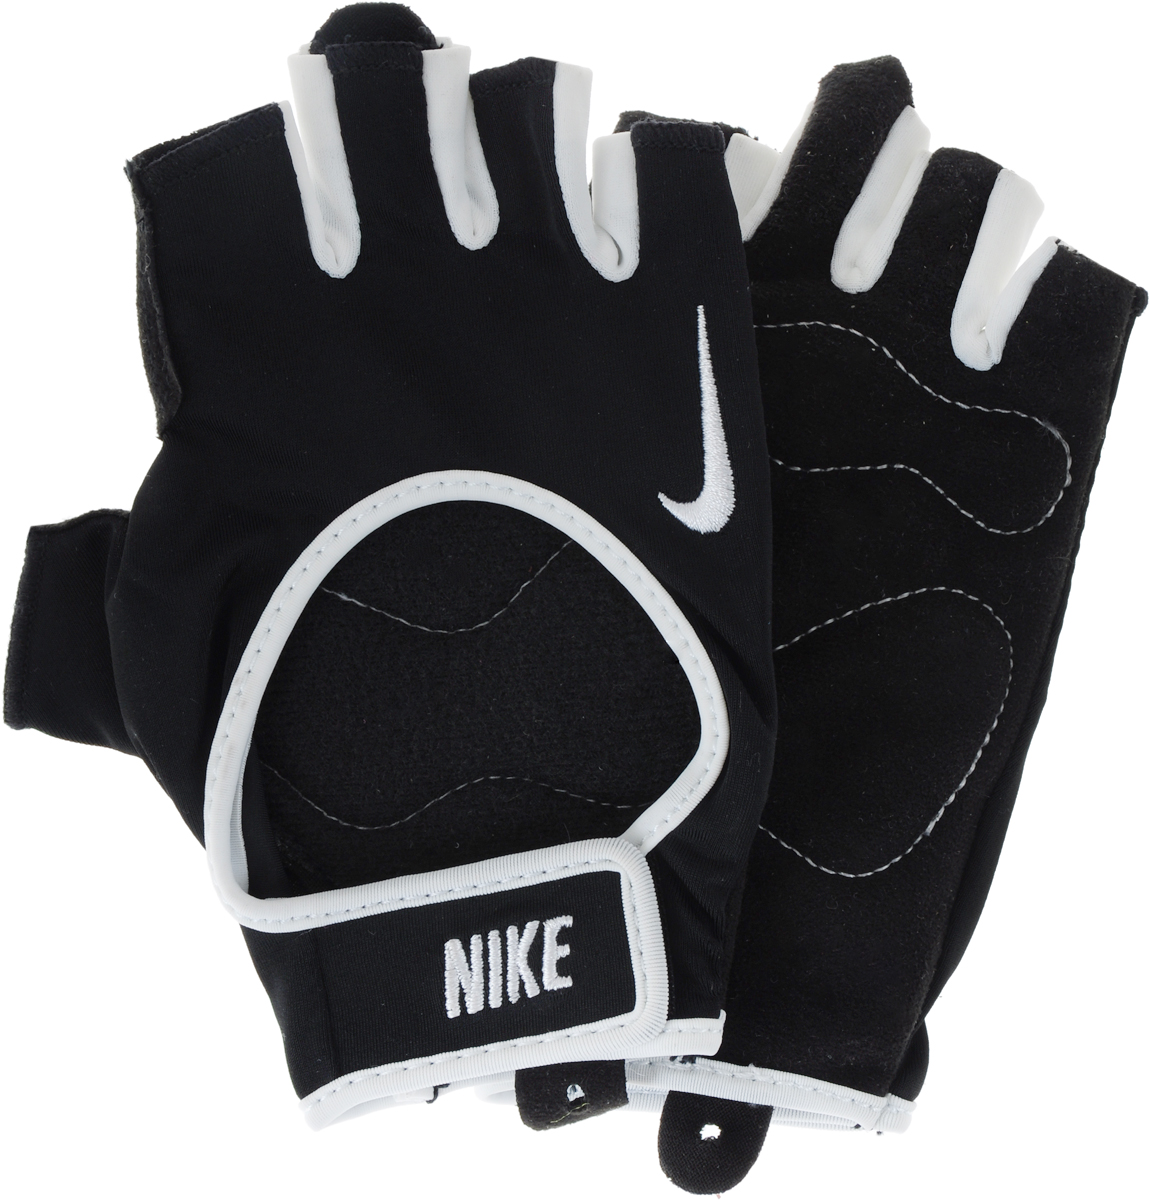 Перчатки для фитнеса мужские Nike Men's Fundamental Training Gloves, цвет: черный. Размер XS nike перчатки для фитнеса женские nike